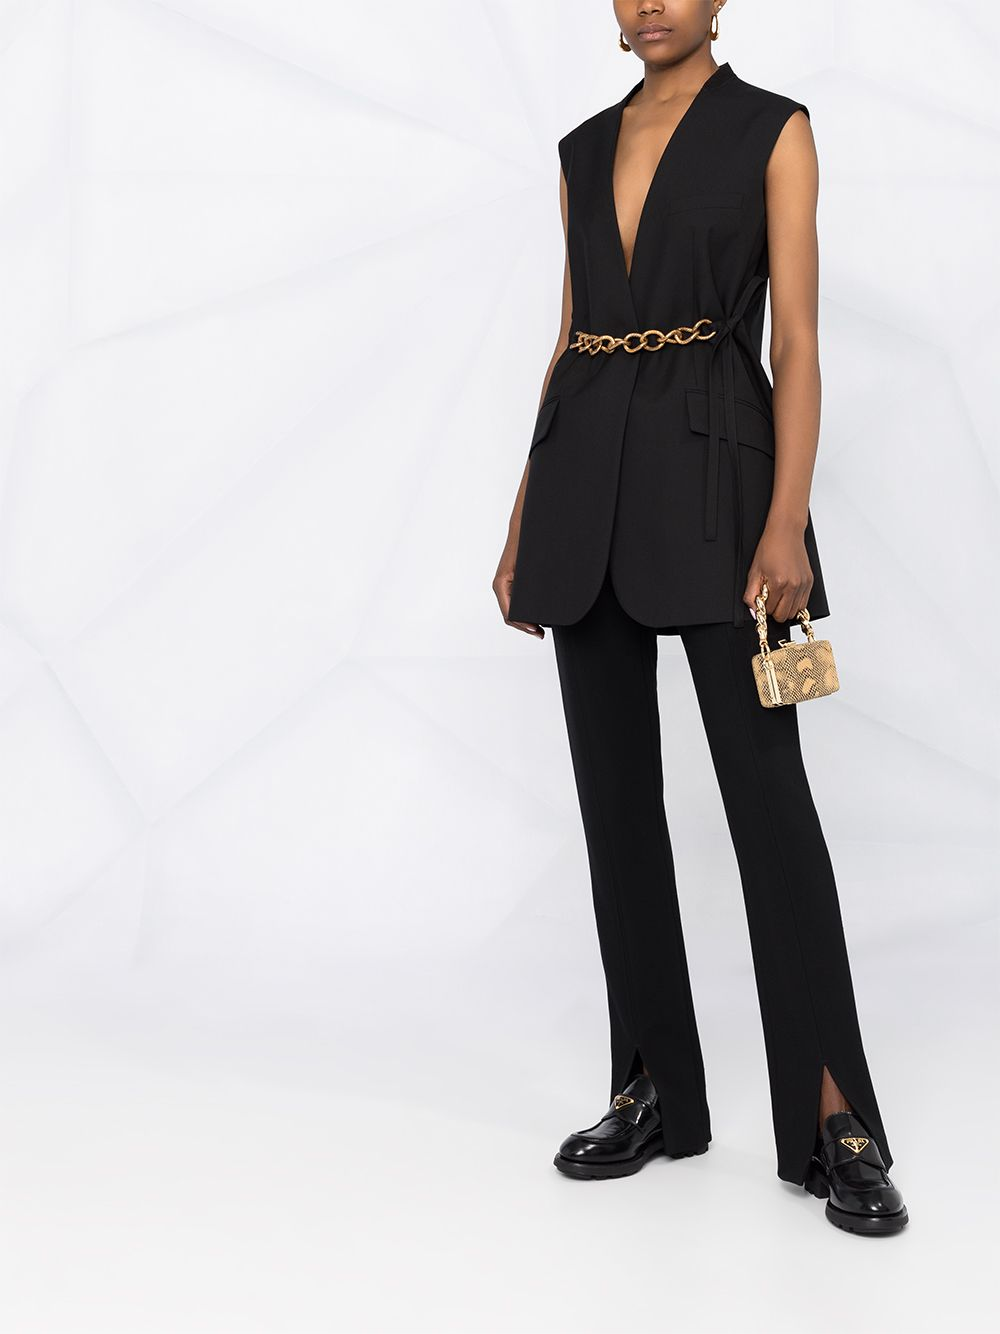 Gilet in lana nera con cintura a catena color oro GIVENCHY | Giacche | BW30CH12JF001